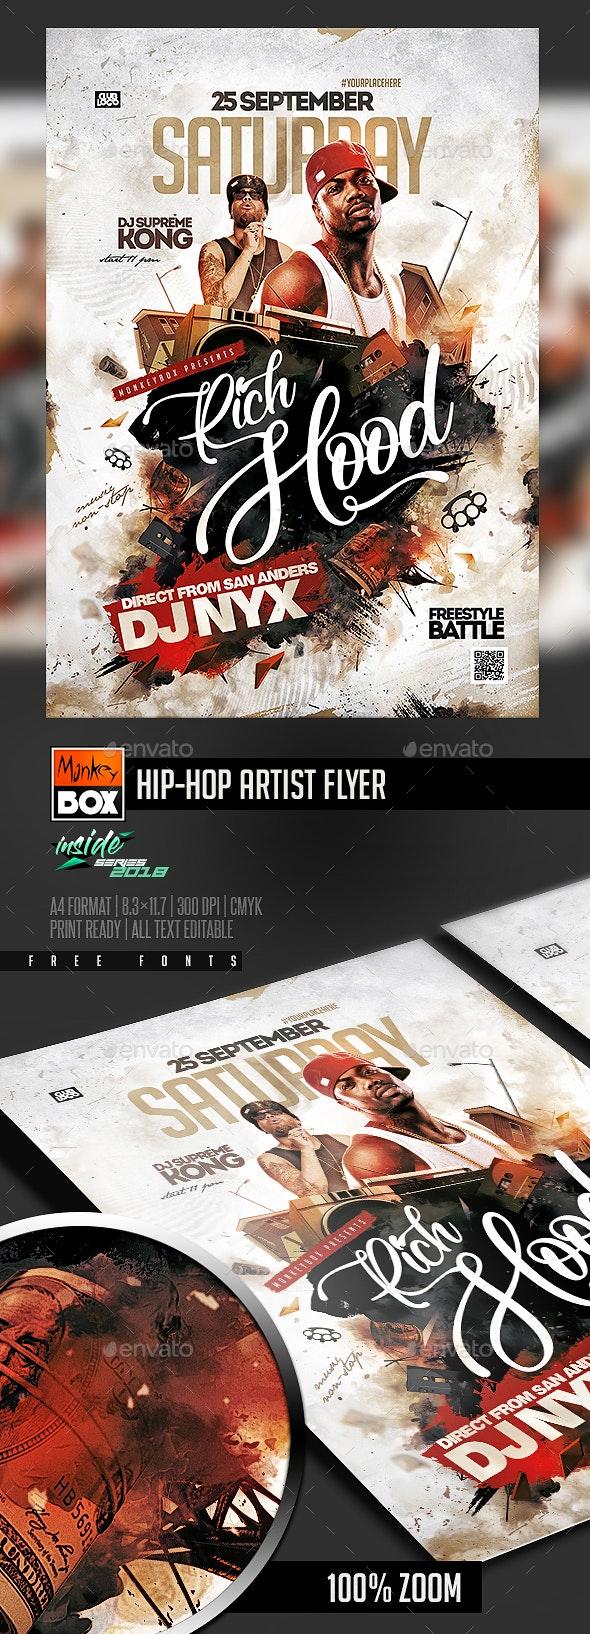 Hip-Hop Artist Flyer - Events Flyers